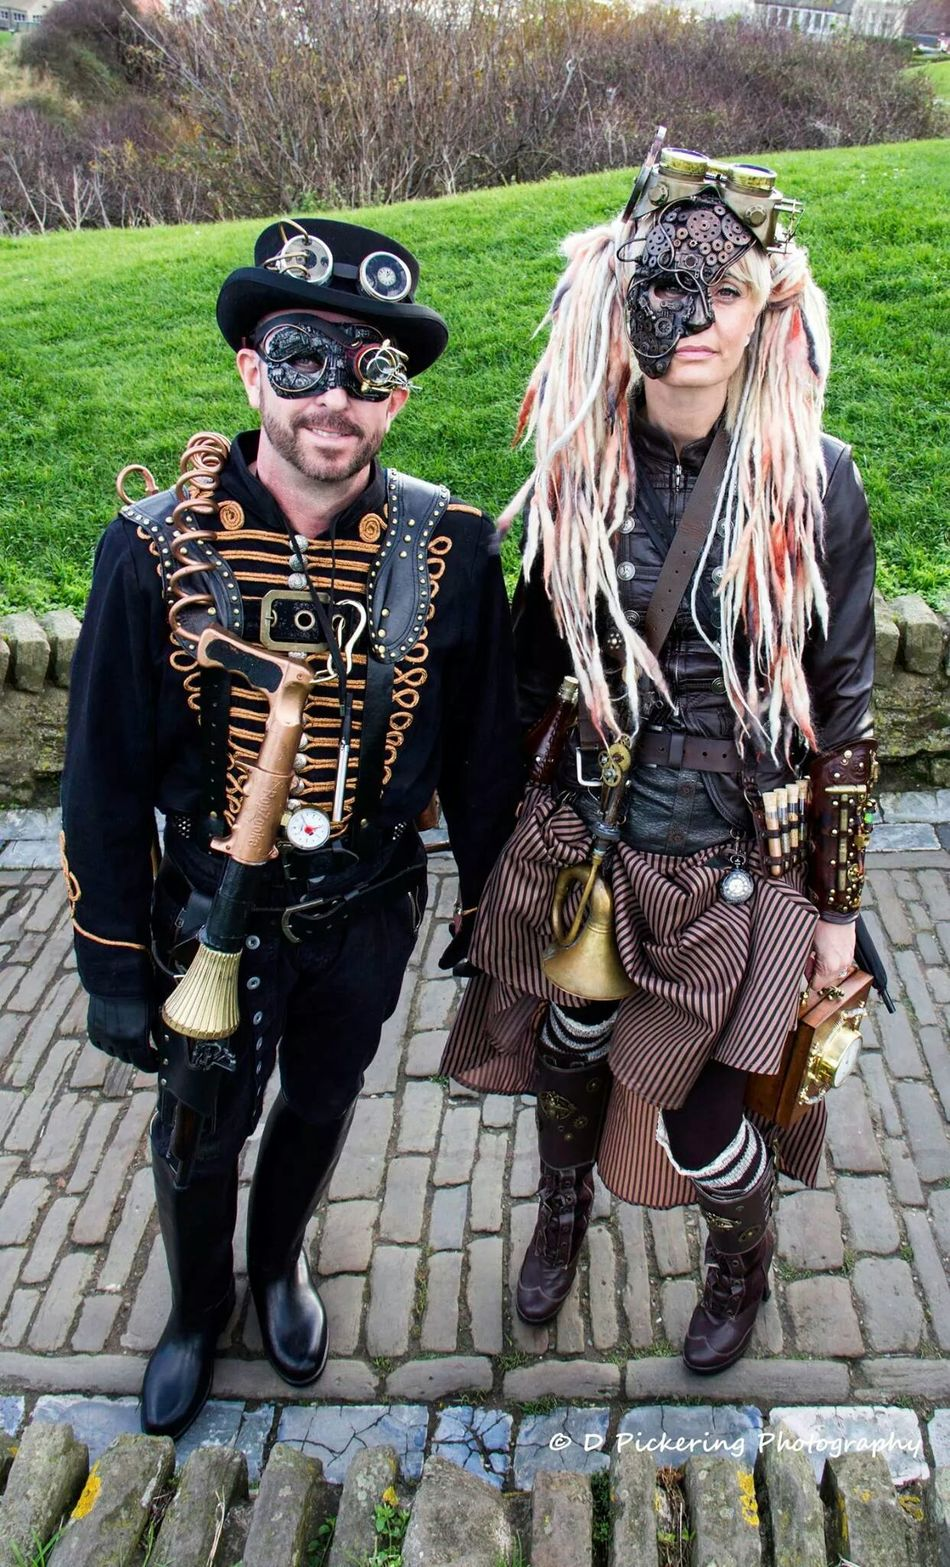 Steampunks Walking Around Street Photography Steampunk Whitby Goth Weekend